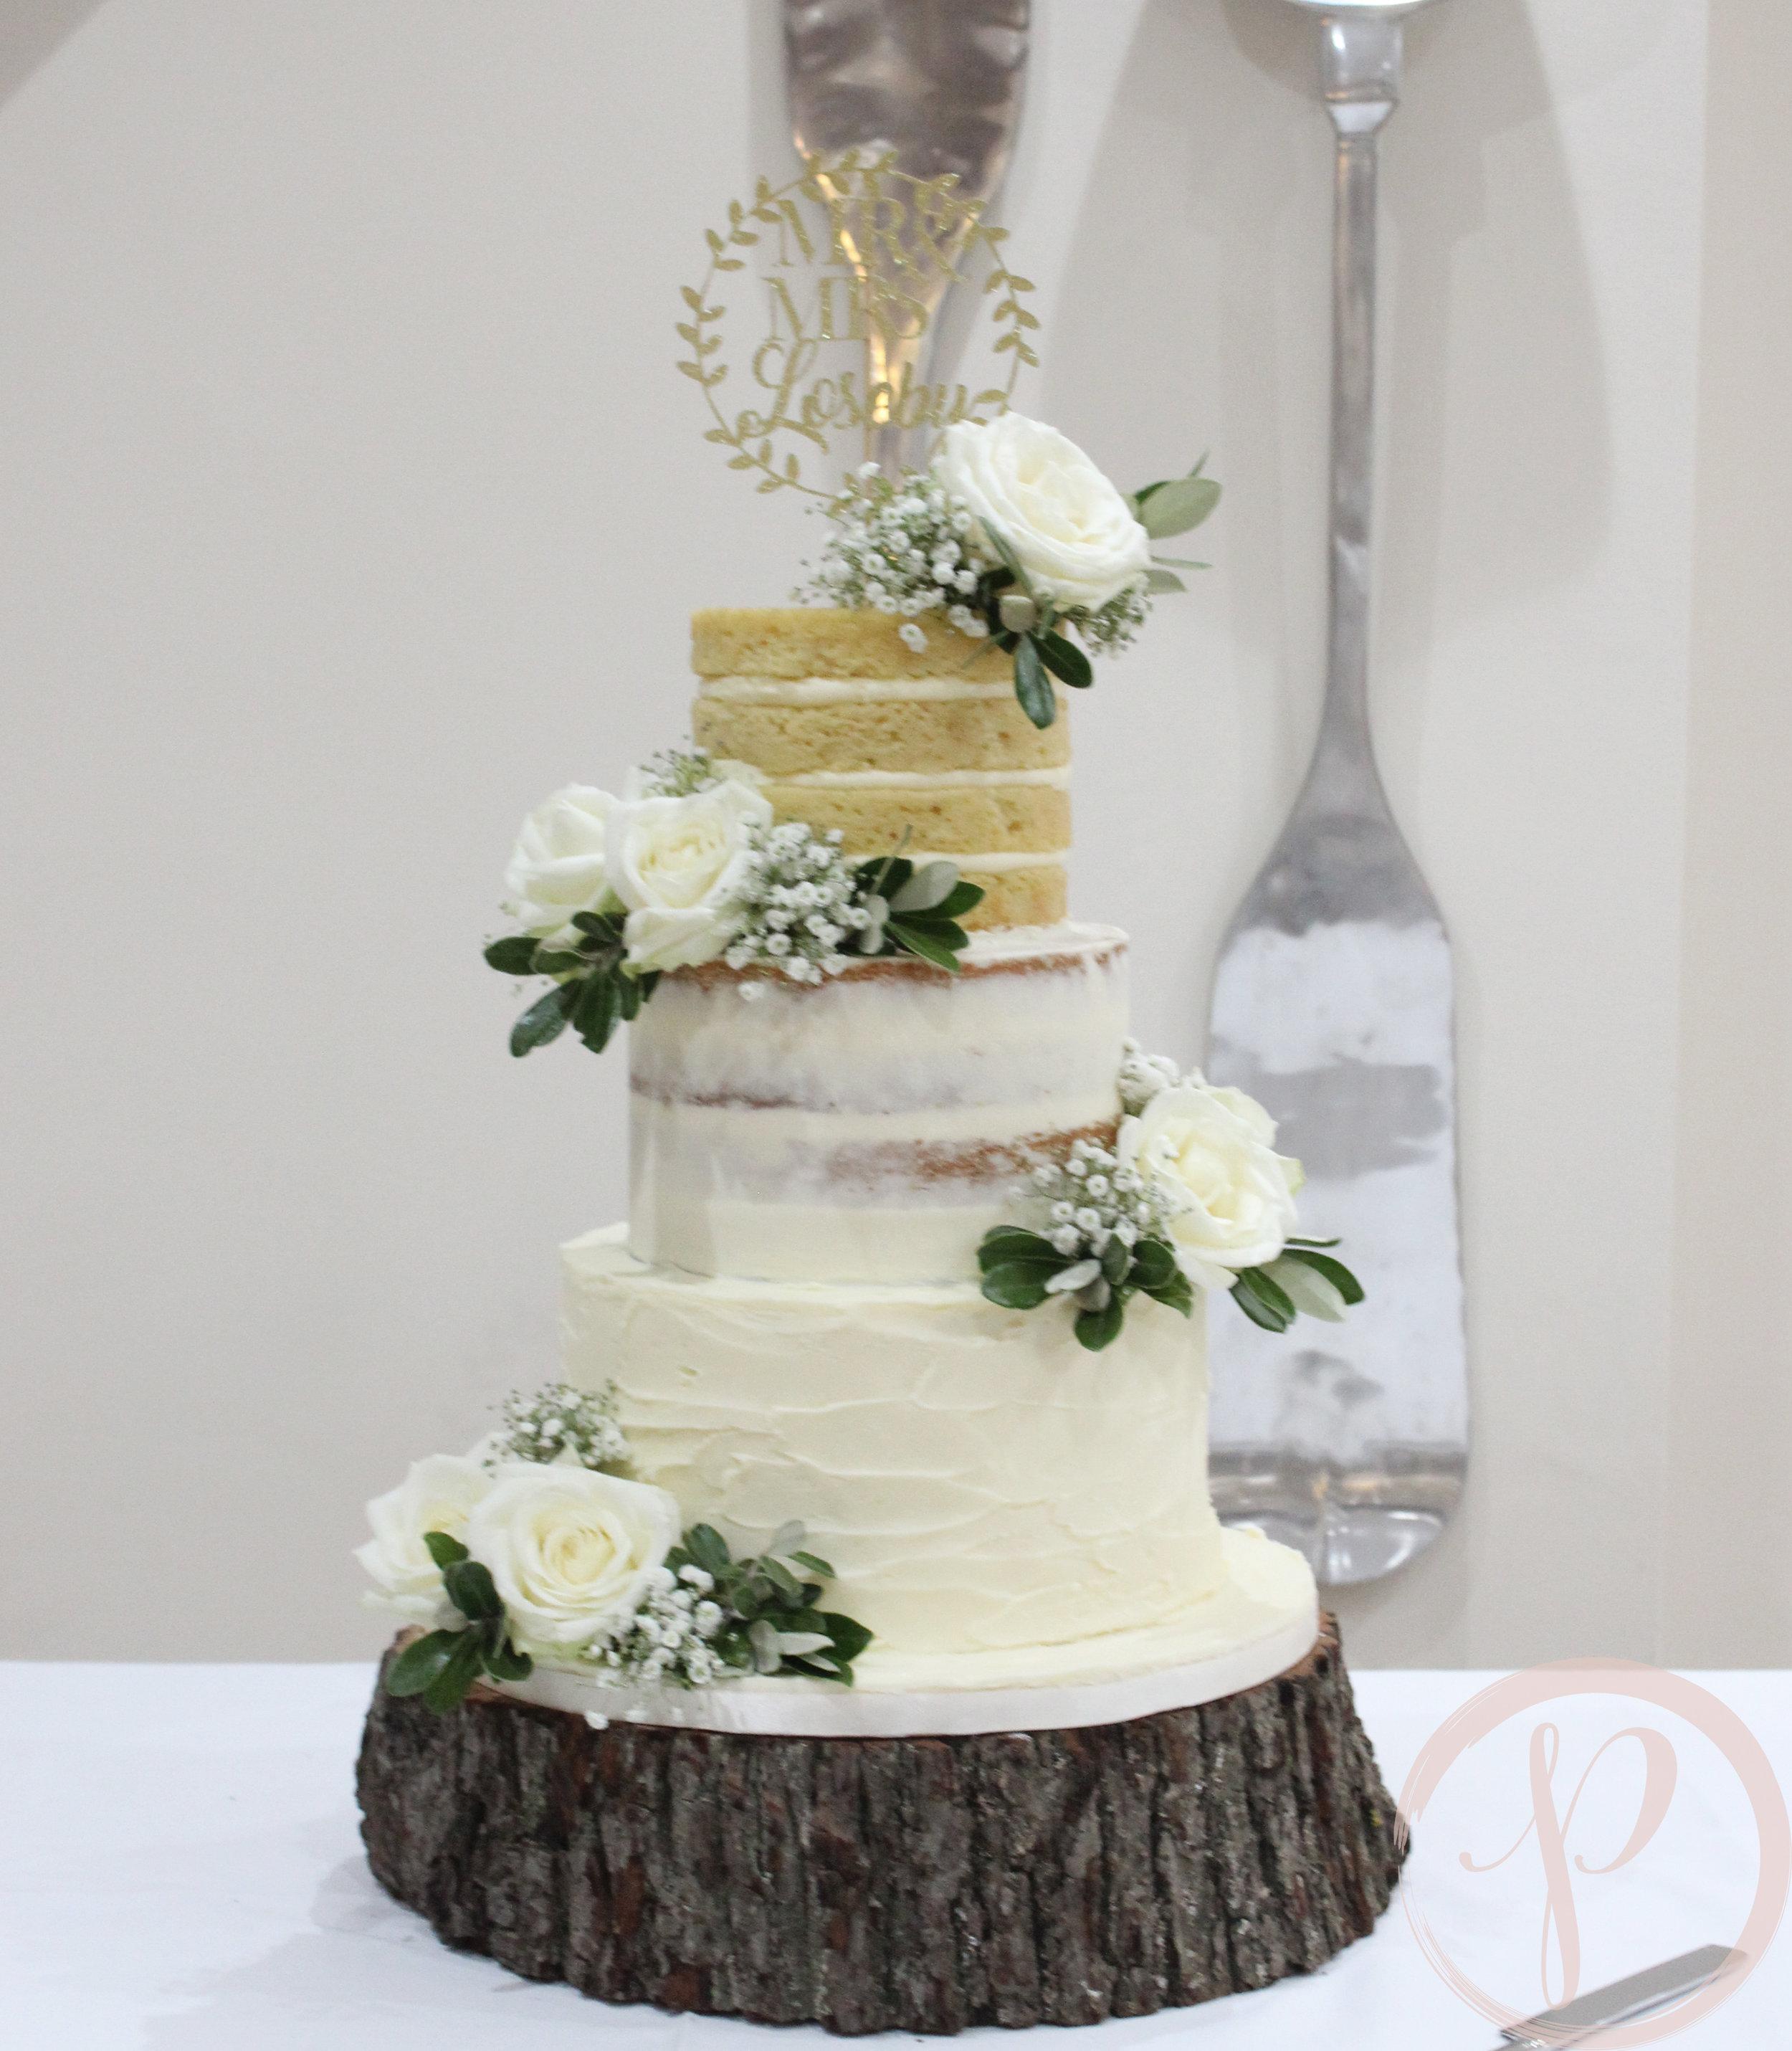 gradiented naked wedding cake with beautiful white flowers.jpg